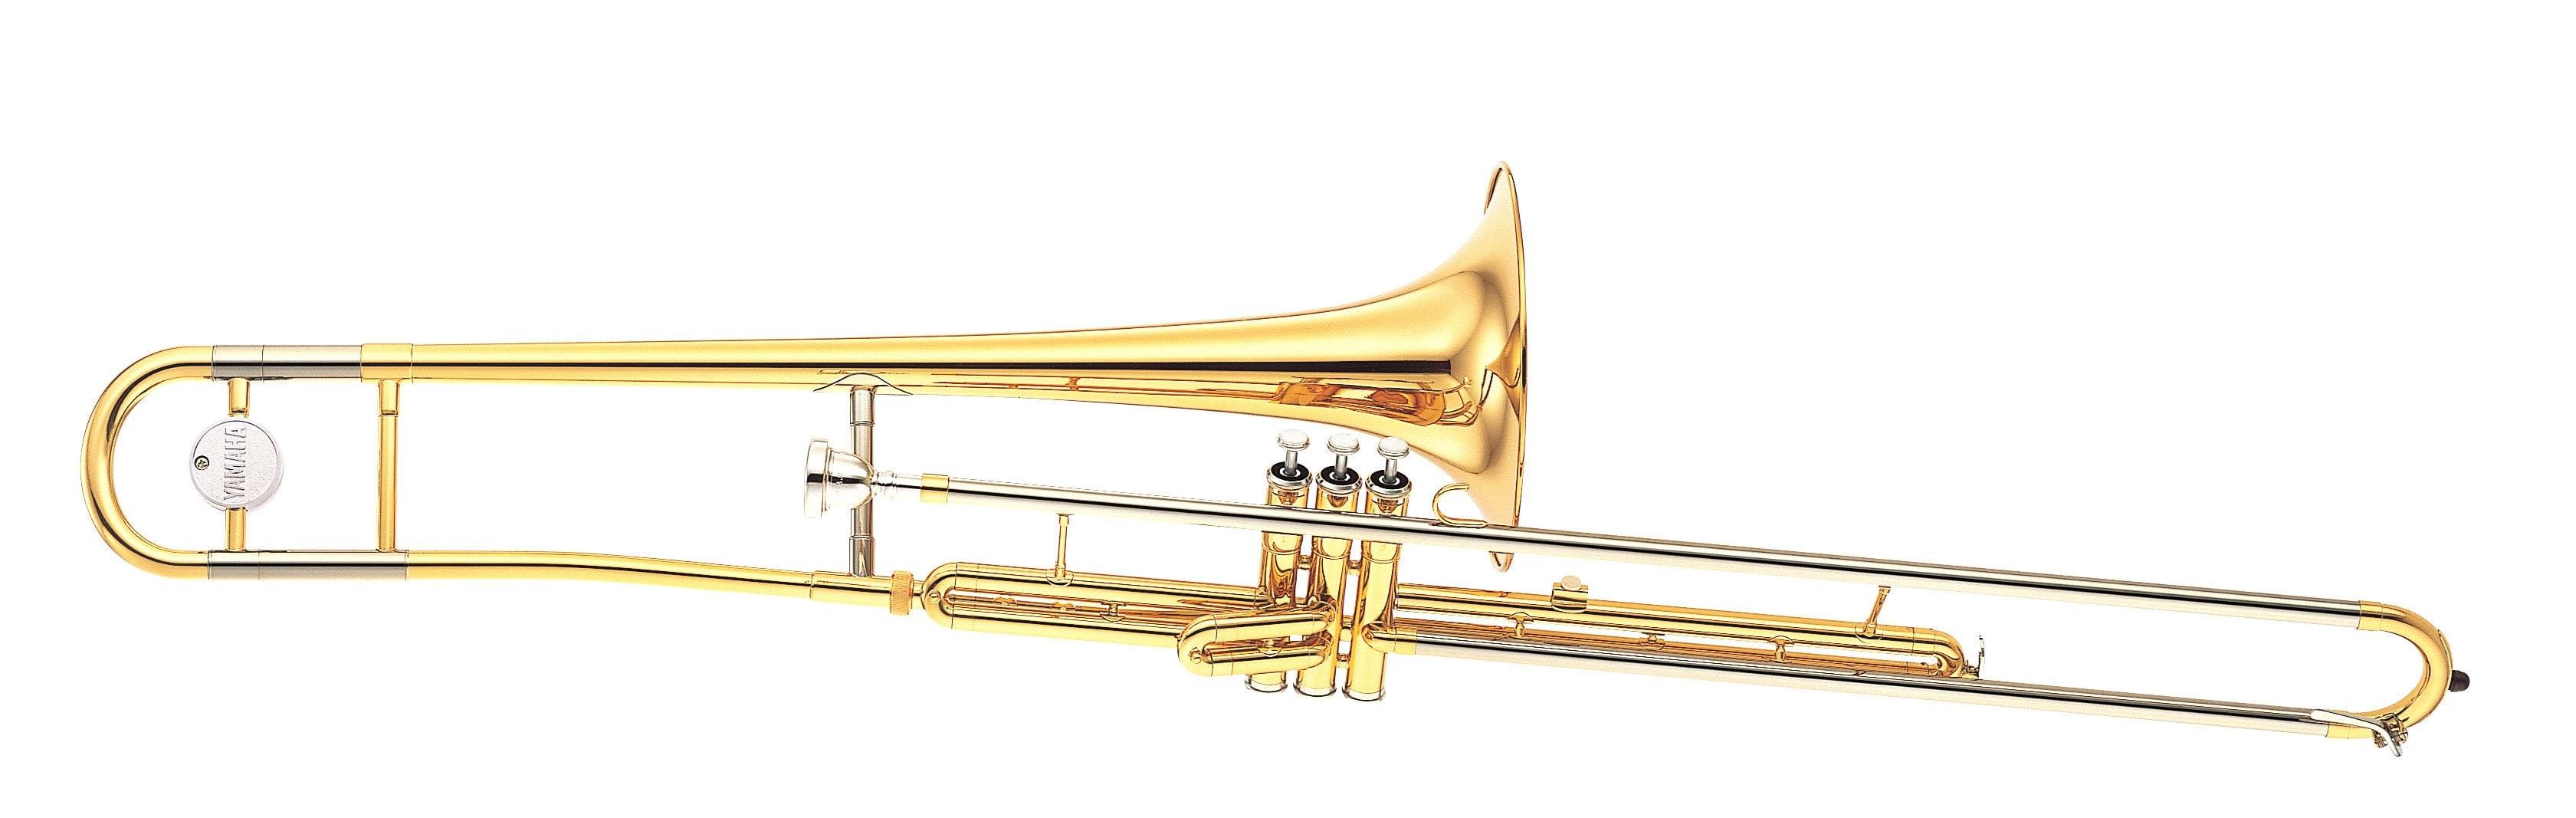 yamaha trombone. ysl-354v standard valve trombone yamaha